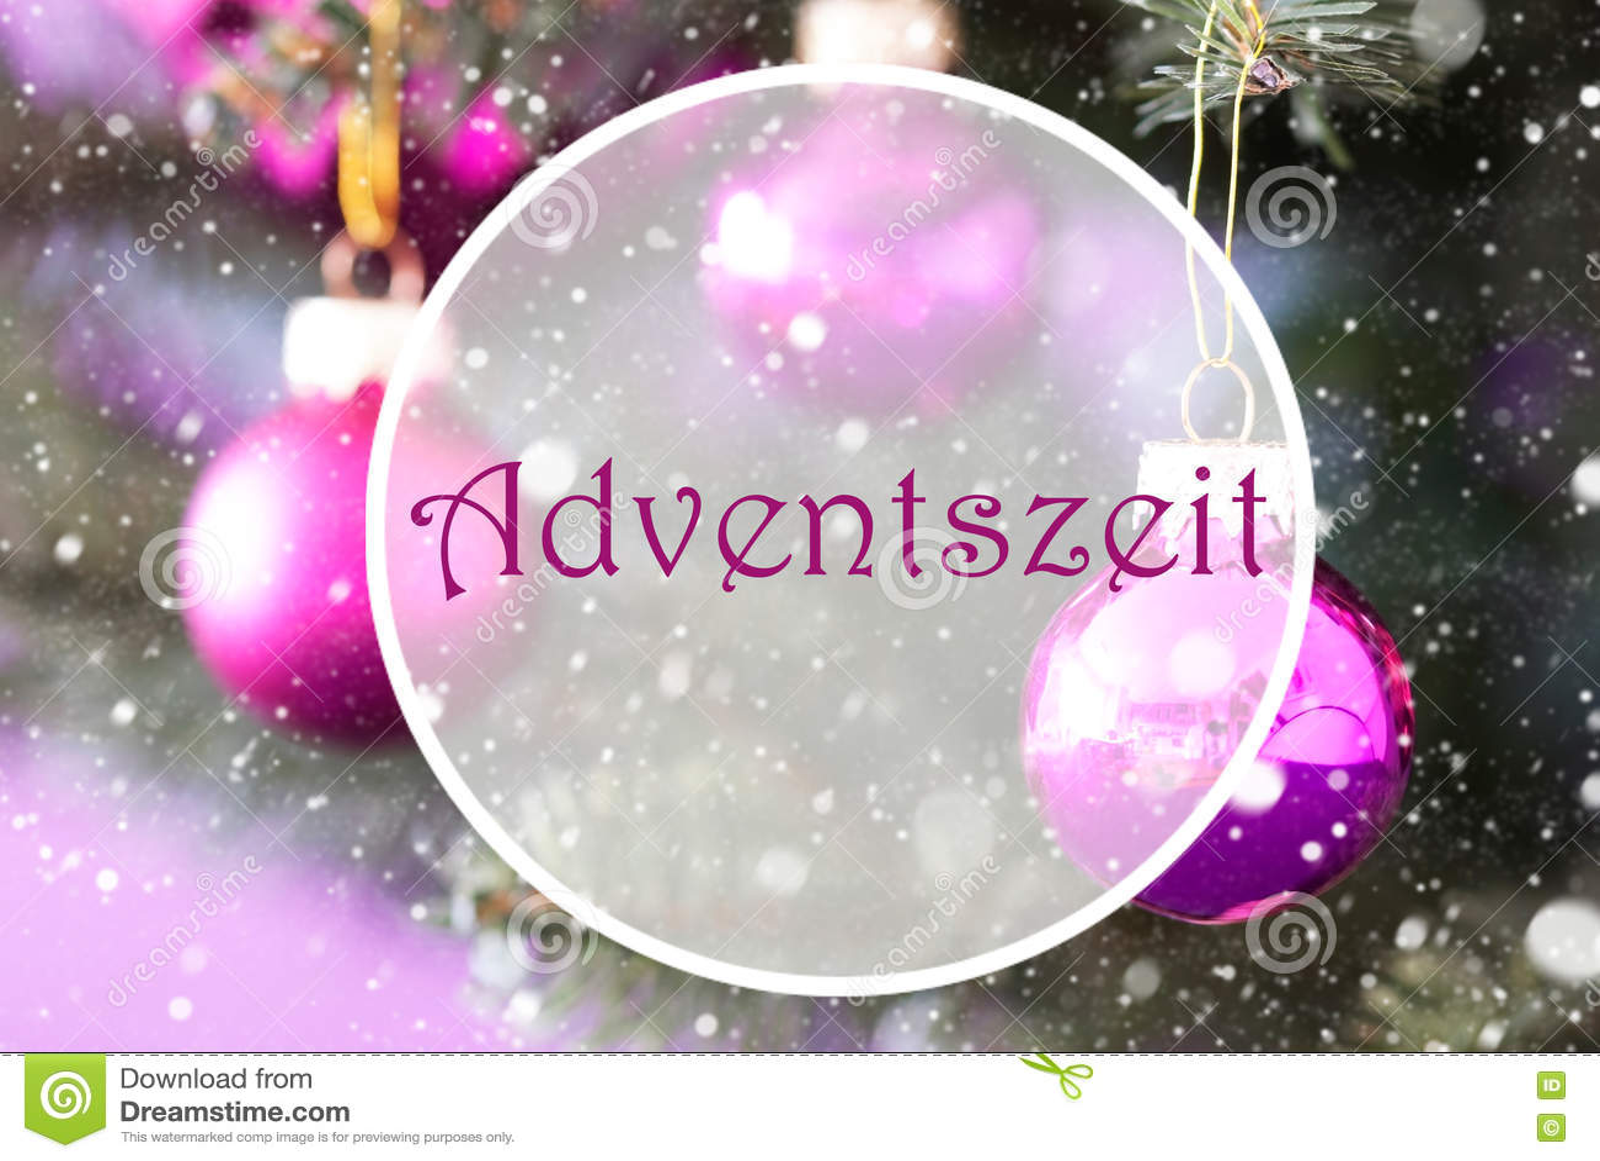 Rose quartz christmas balls adventszeit means advent season stock rose quartz christmas balls adventszeit means advent season m4hsunfo